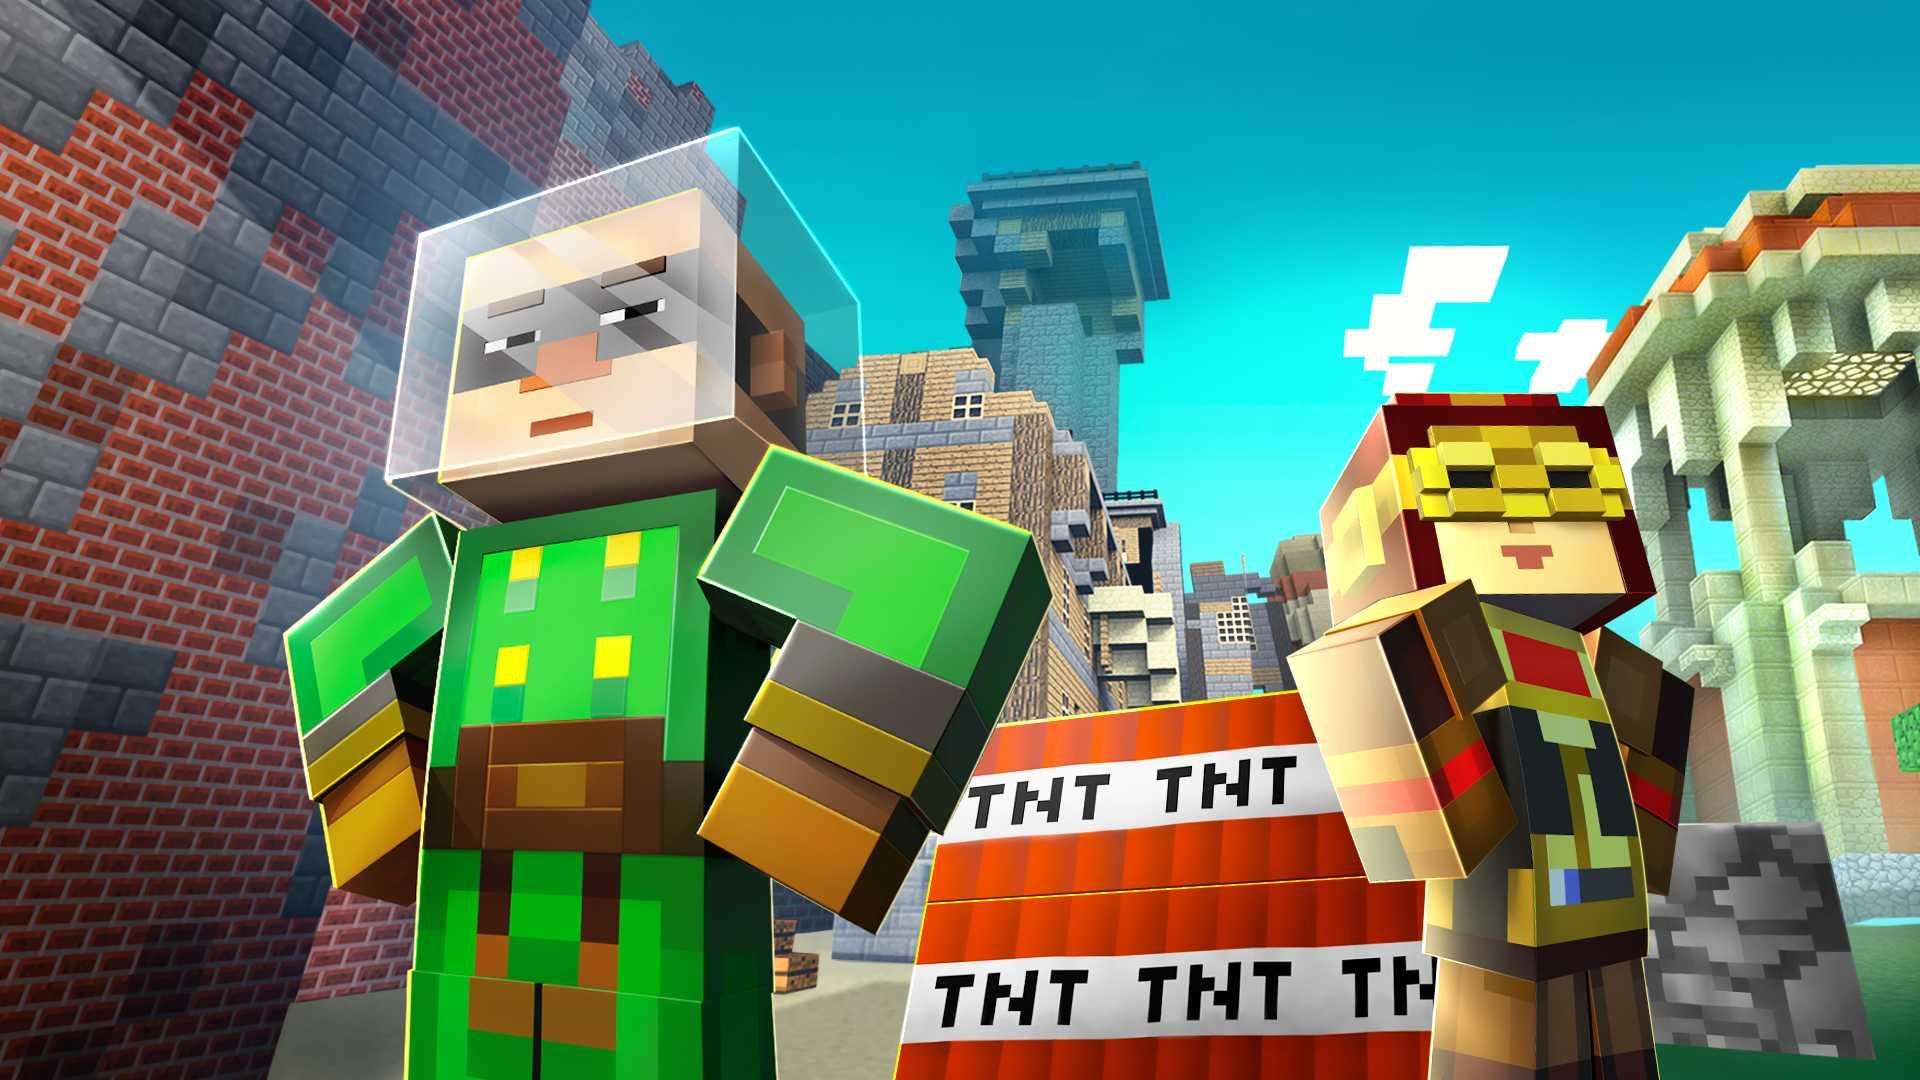 скачать эпизод 2 minecraft story mode на андроид #7